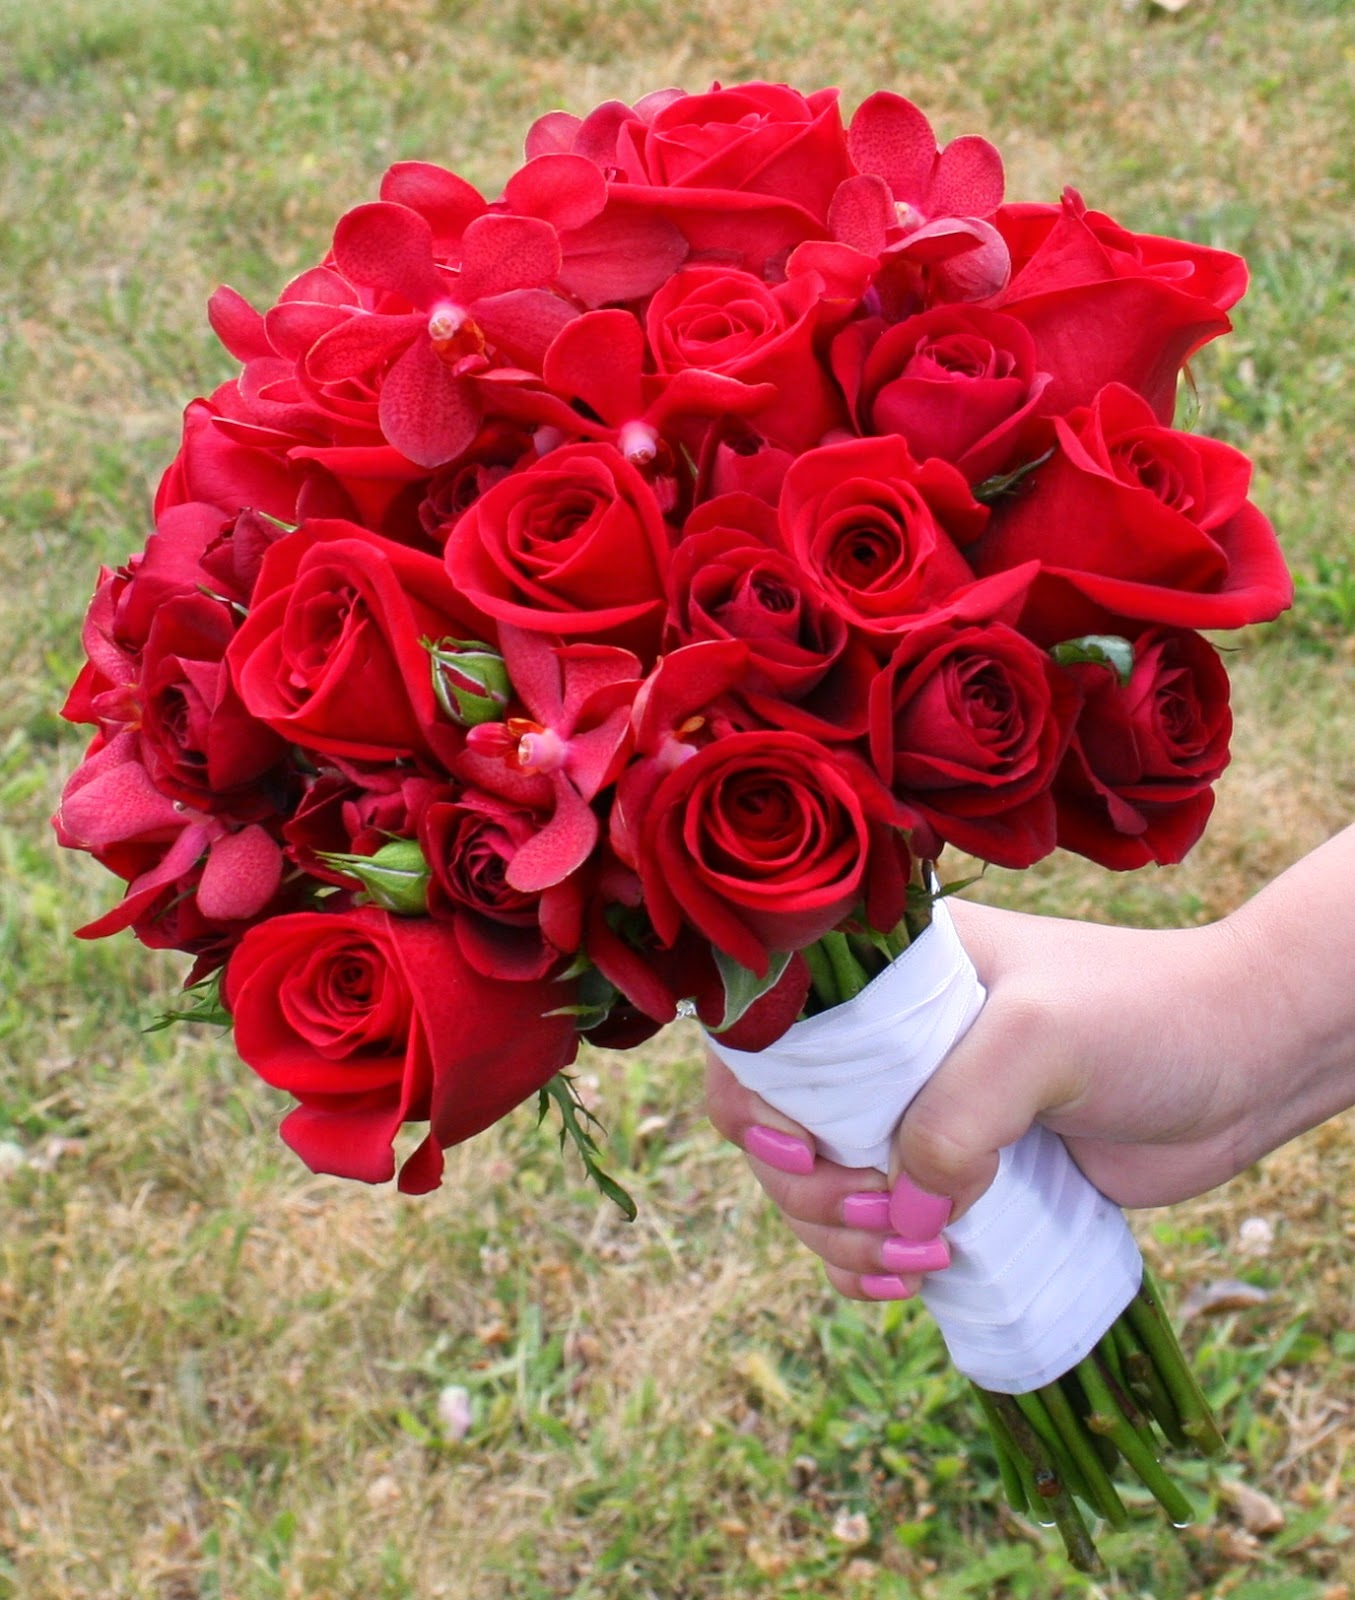 Bunga Mawar Si Bunga Cinta Beda Warna Beda Makna